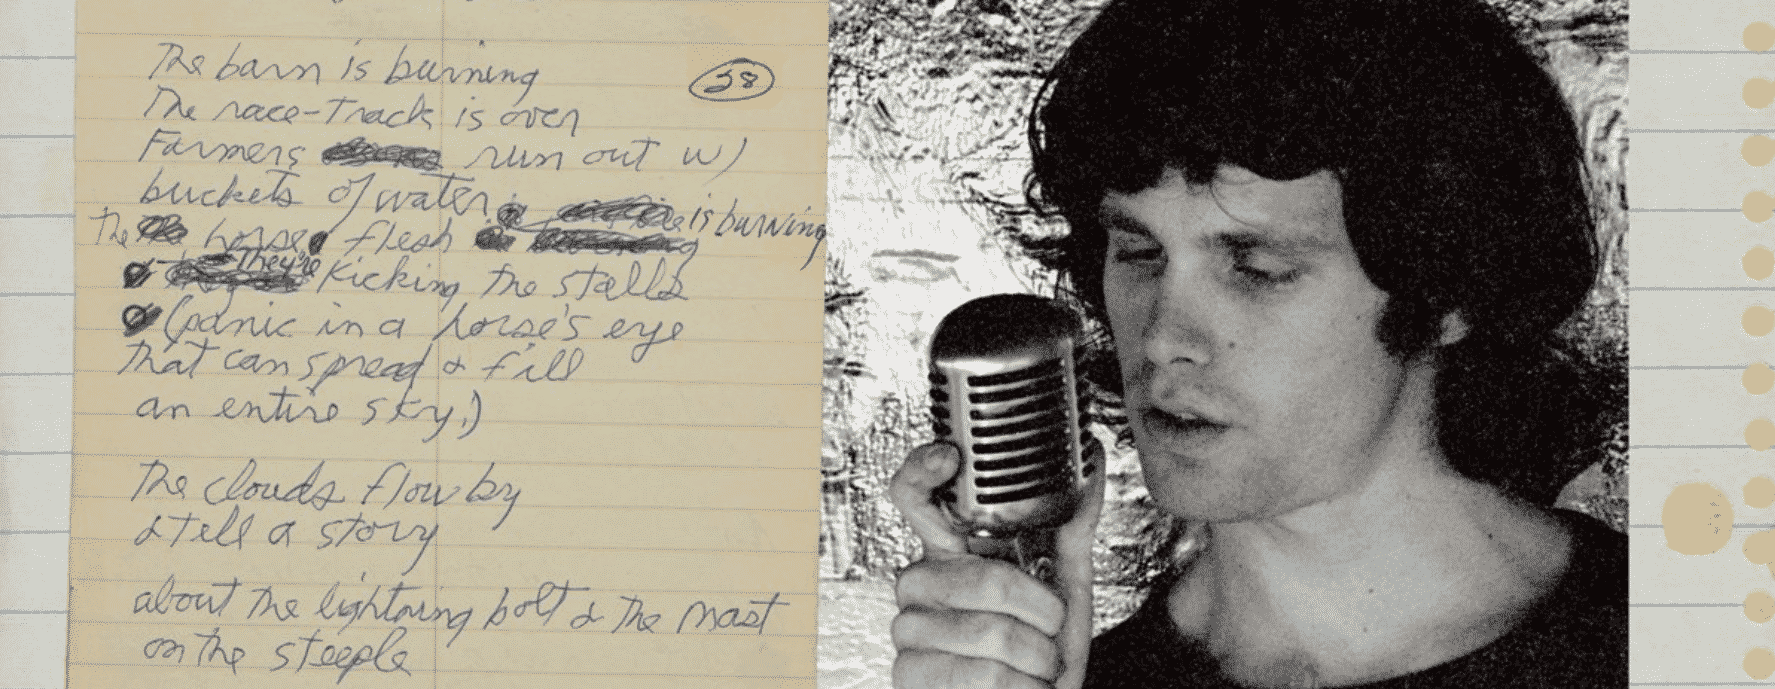 The Doors-Jim Morrison